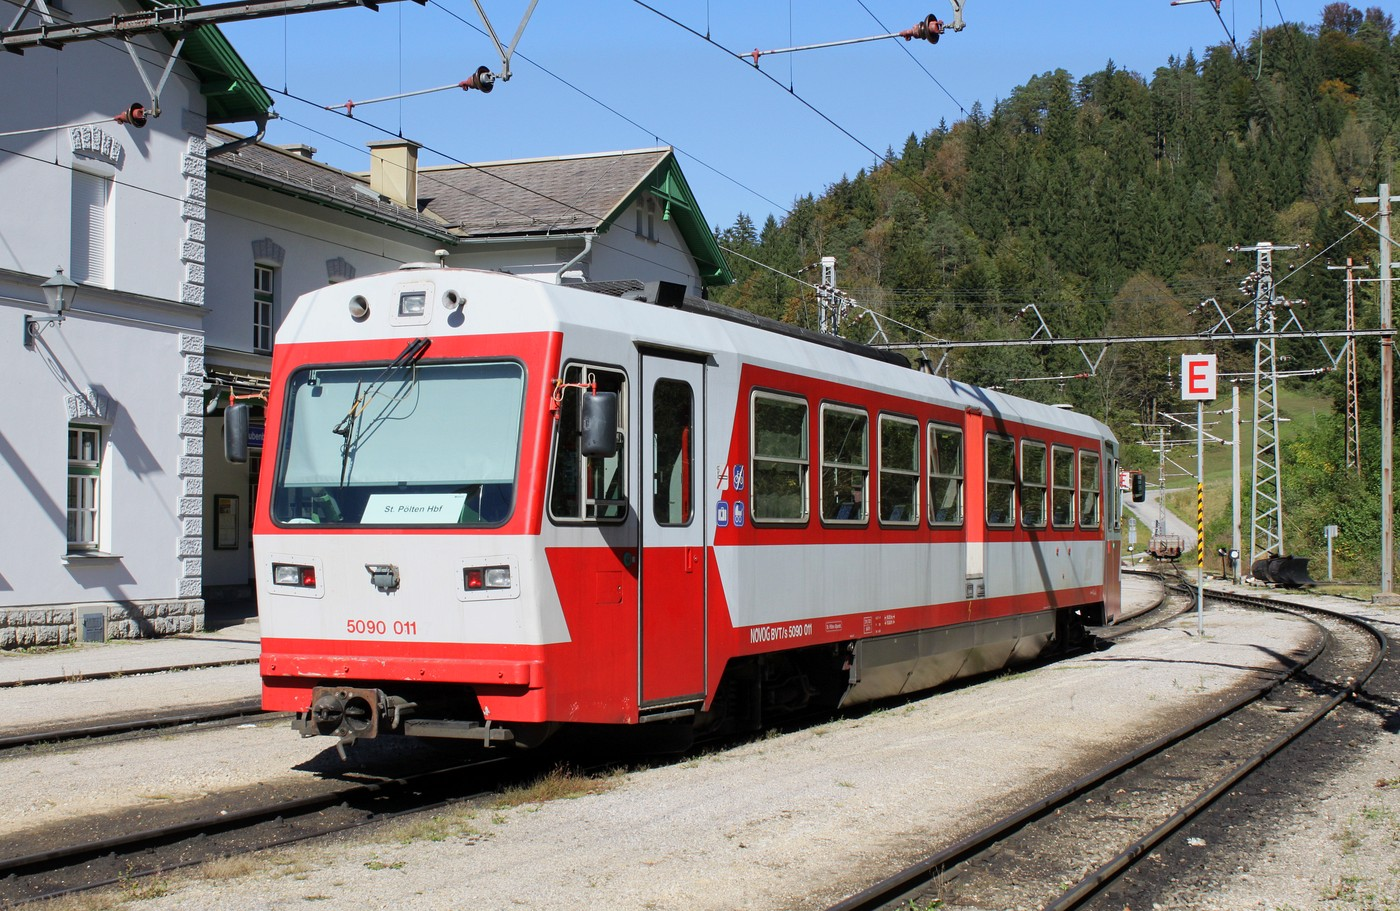 http://www.eisenbahn-im-bild.de/Temp/MZB_IMG_6234.jpg